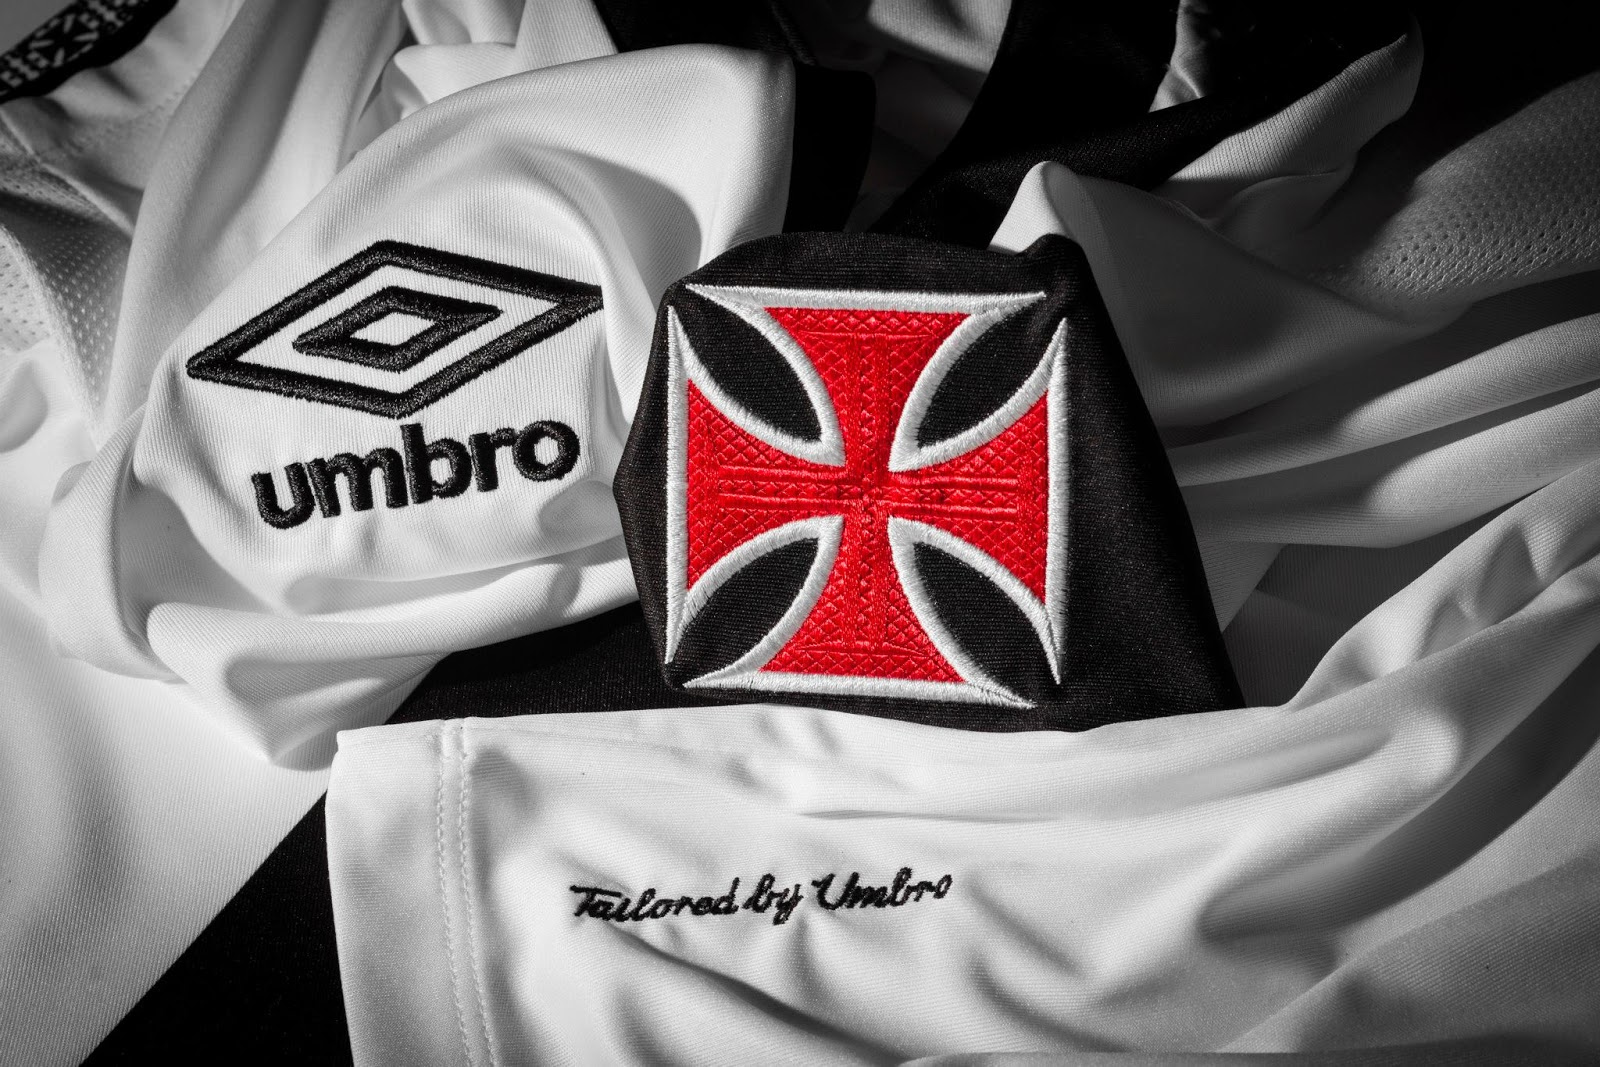 1071722d95 Umbro Vasco da Gama 2014-2015 Home and Away Jersey Shirt Kit   Have ...